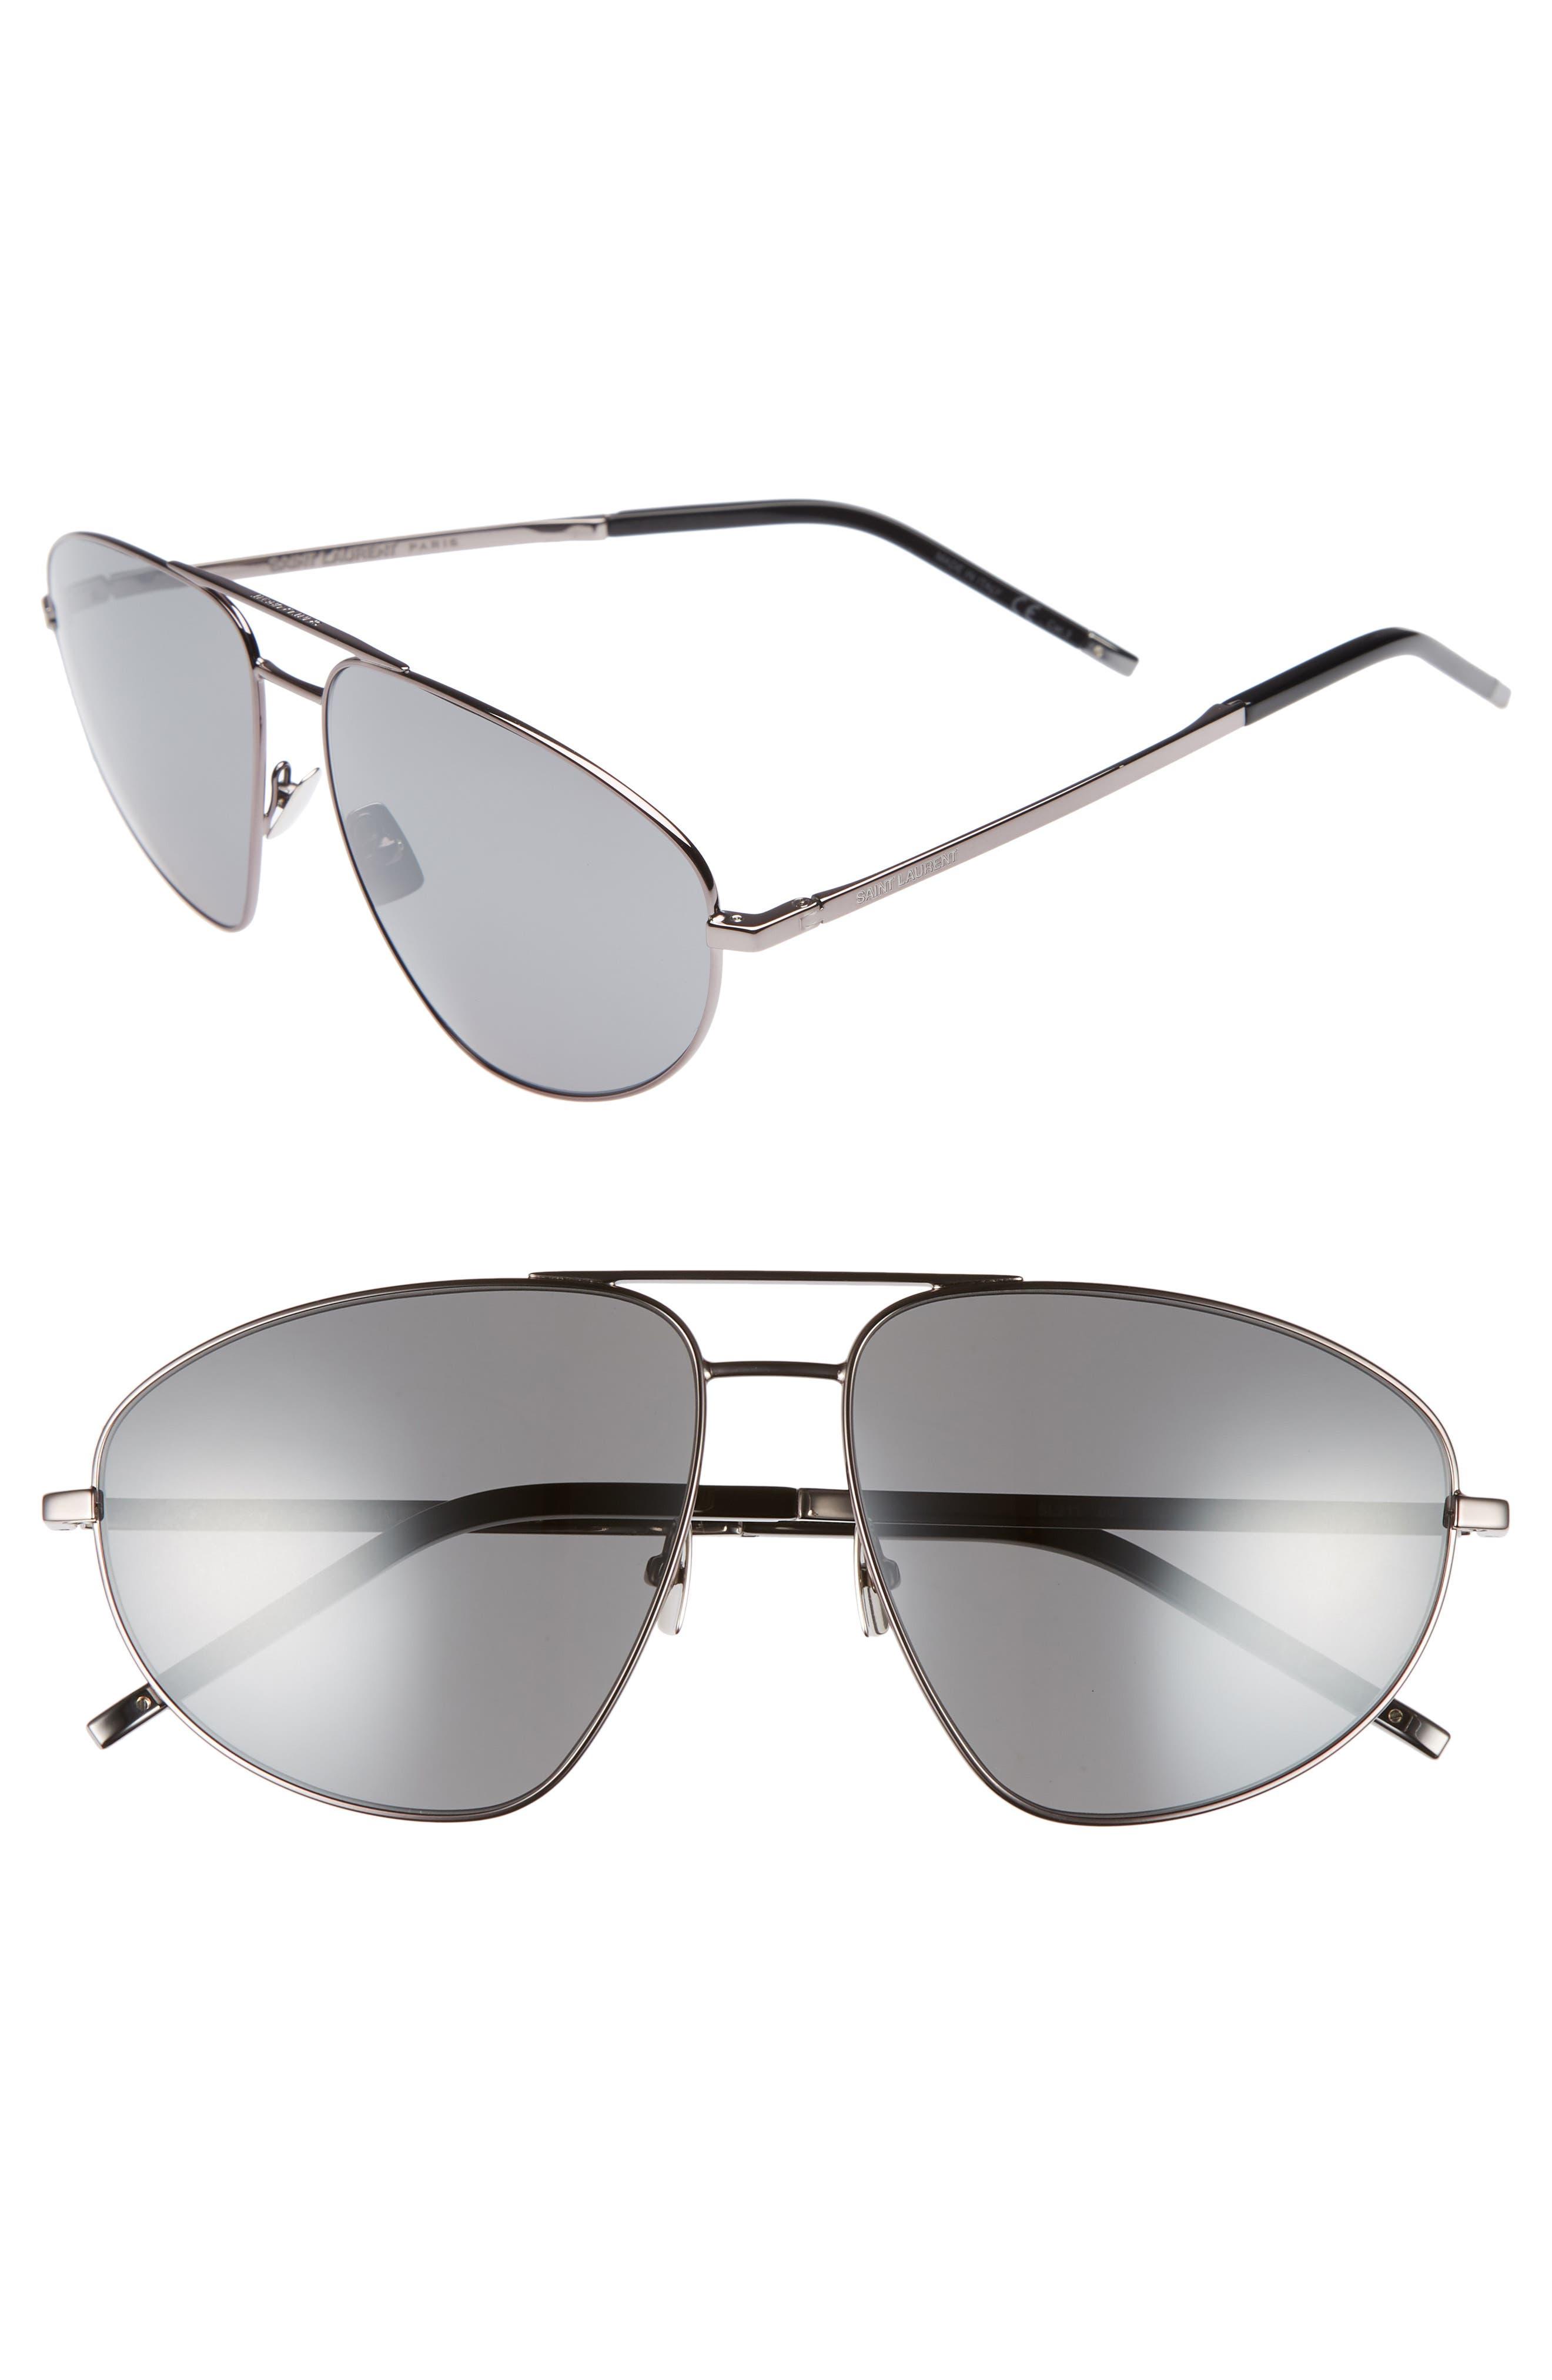 SL 211 60mm Aviator Sunglasses,                             Main thumbnail 1, color,                             Dark Ruthenium/ Black